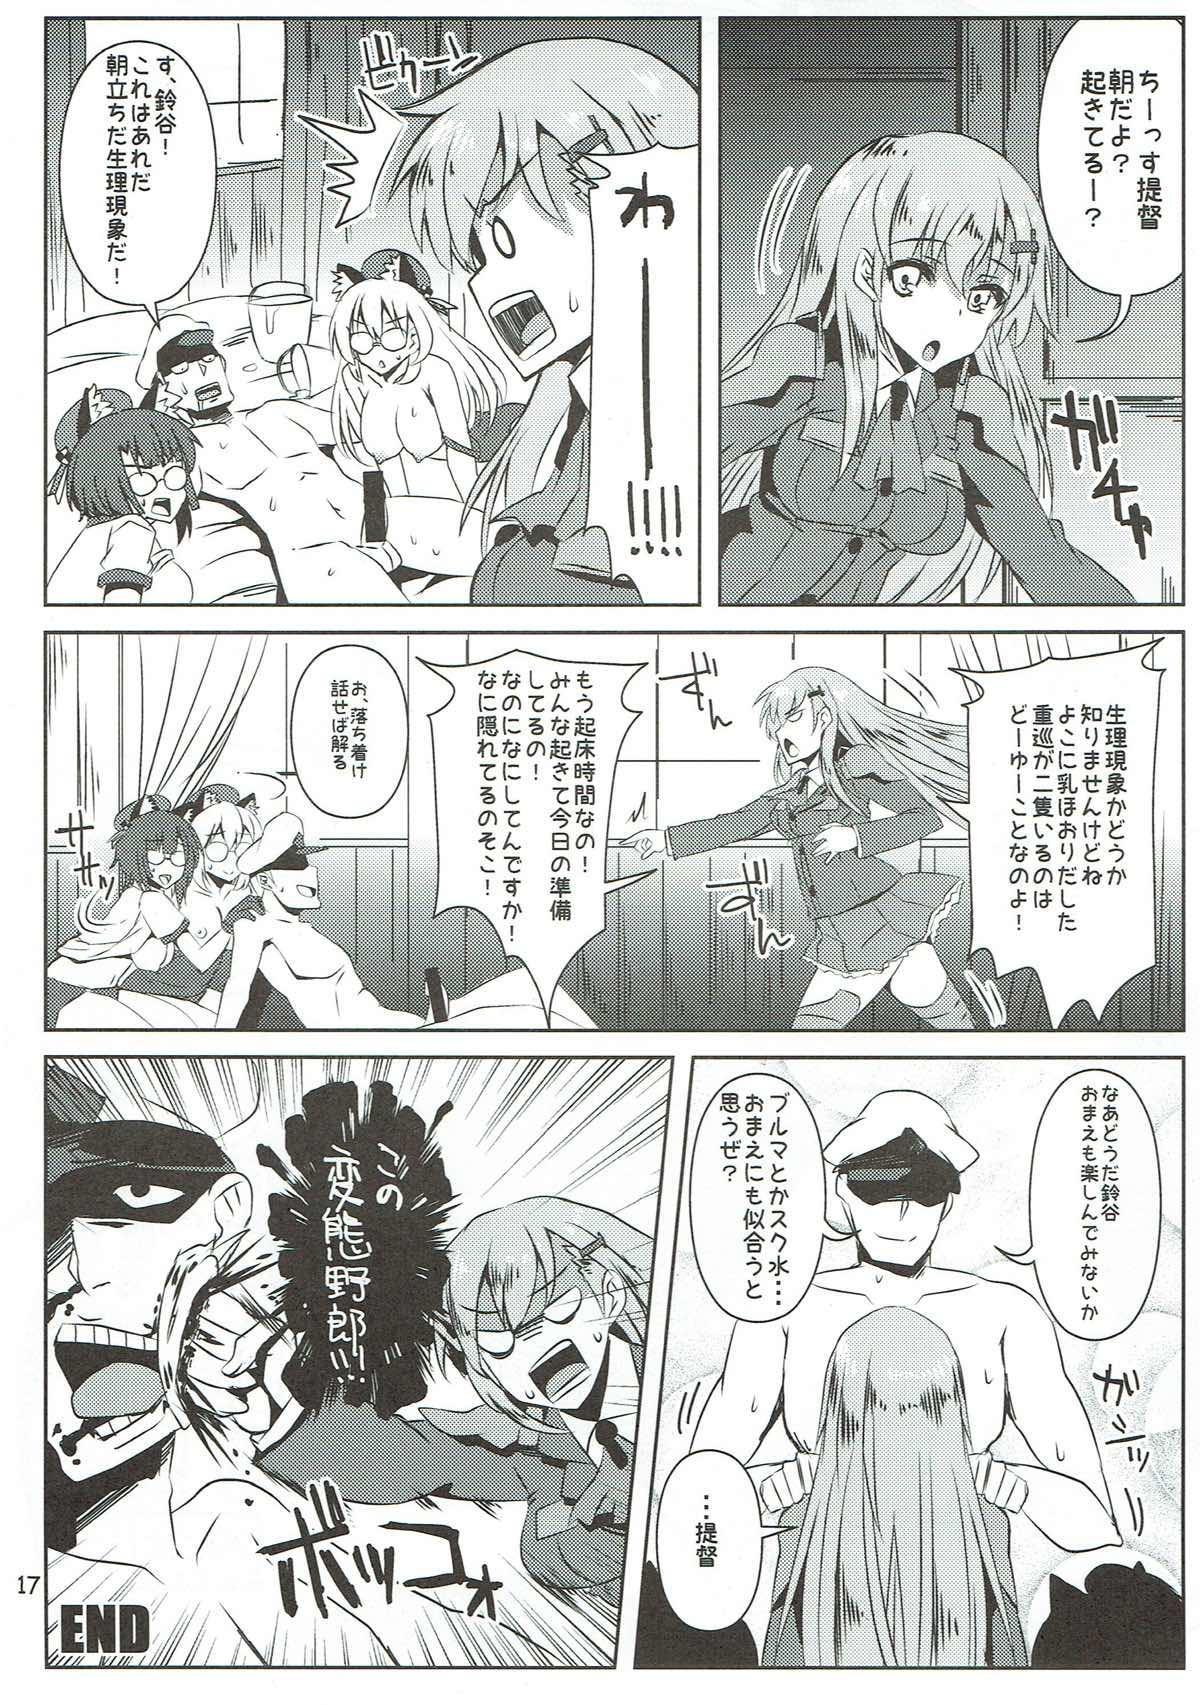 MegaNekoBlooSuku Atataka Oppai 15